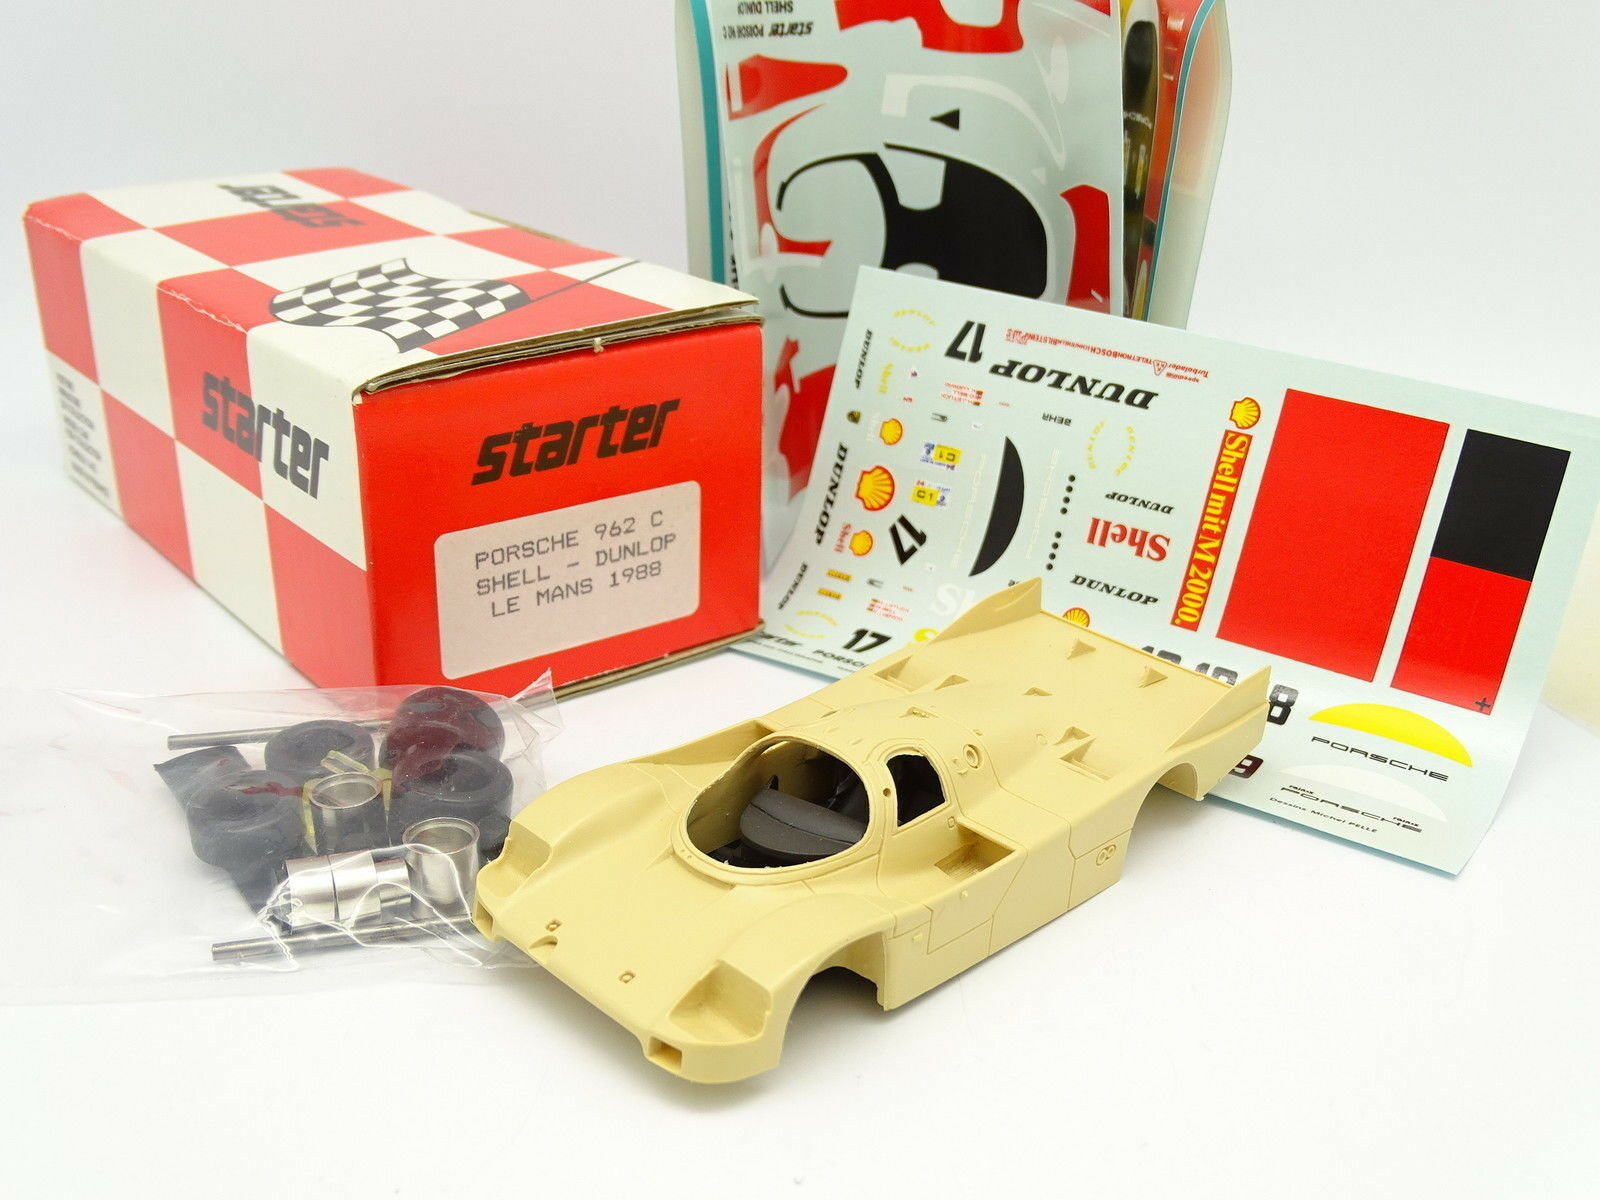 Starter Kit à Monter 1 43 - Porsche 962 C Shell Dunlop  Le Mans 1988